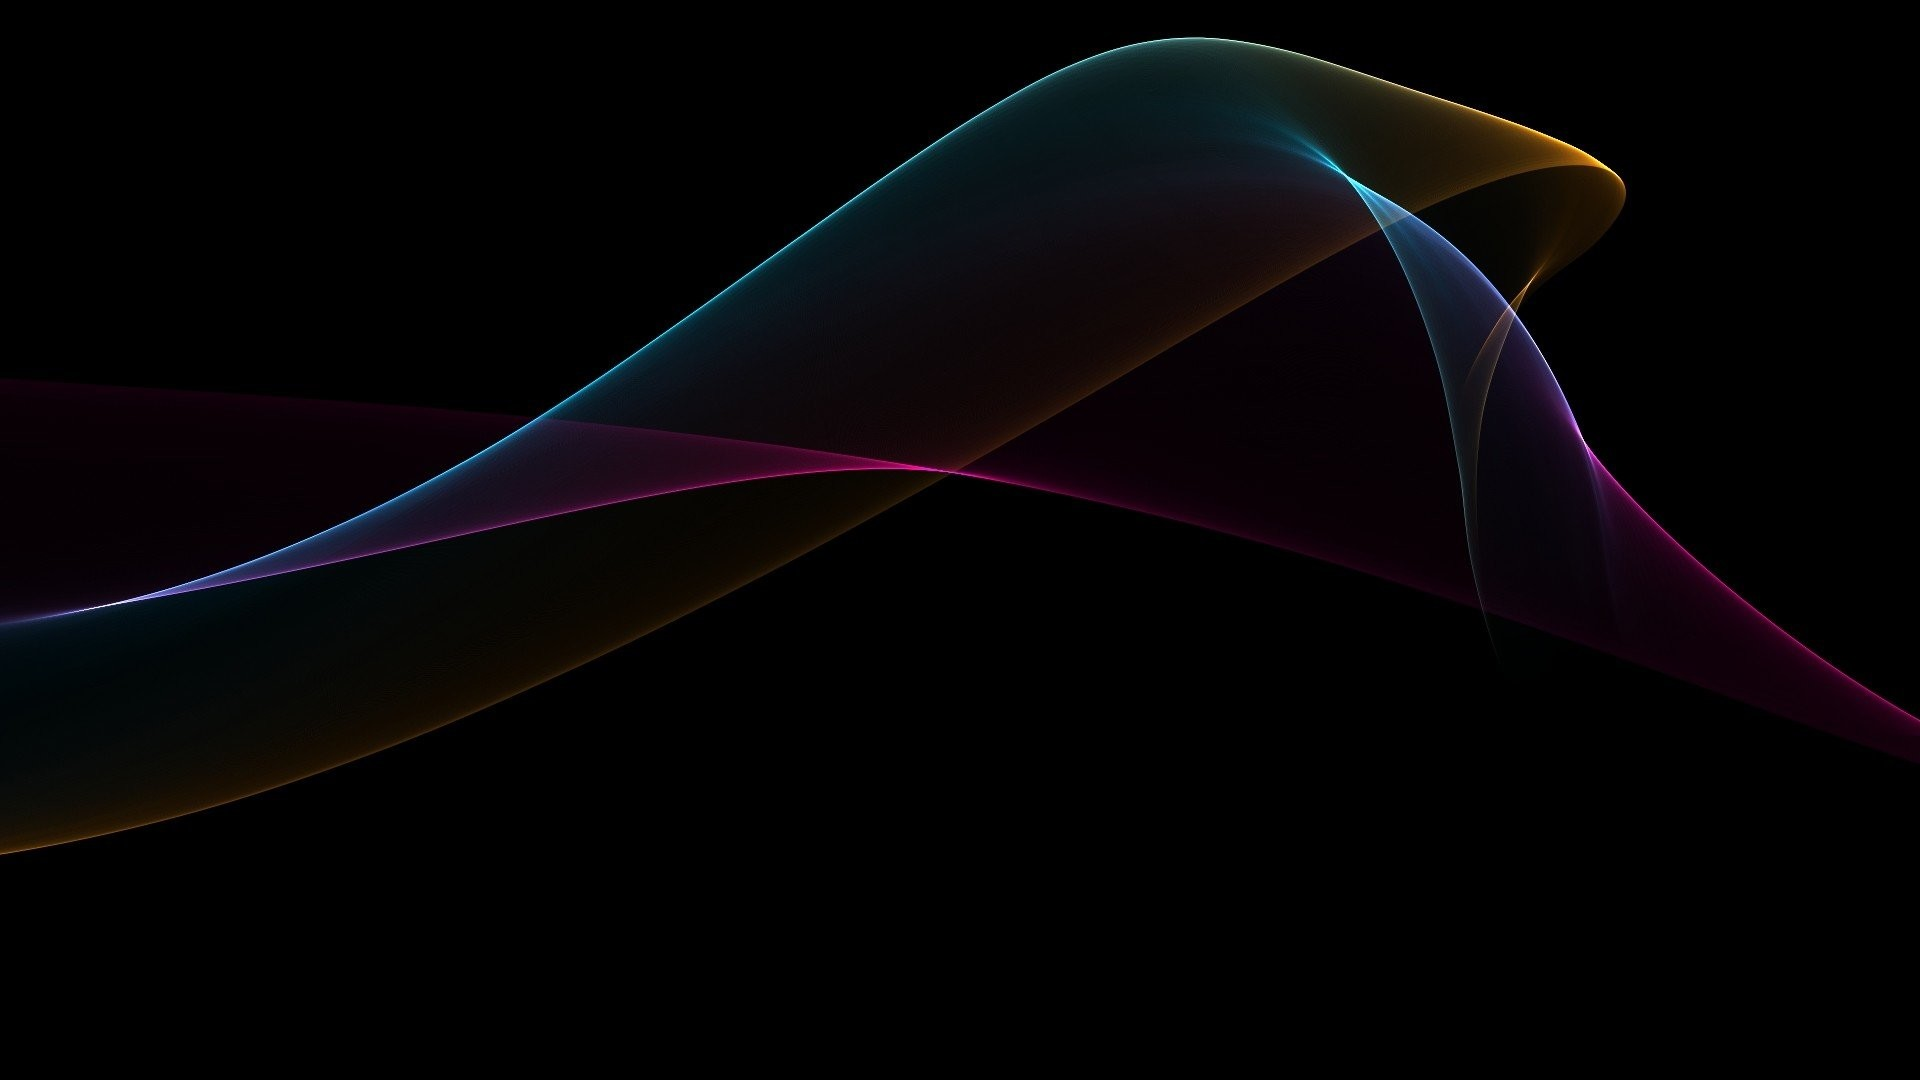 Abstract Black Darks Background Background1 …